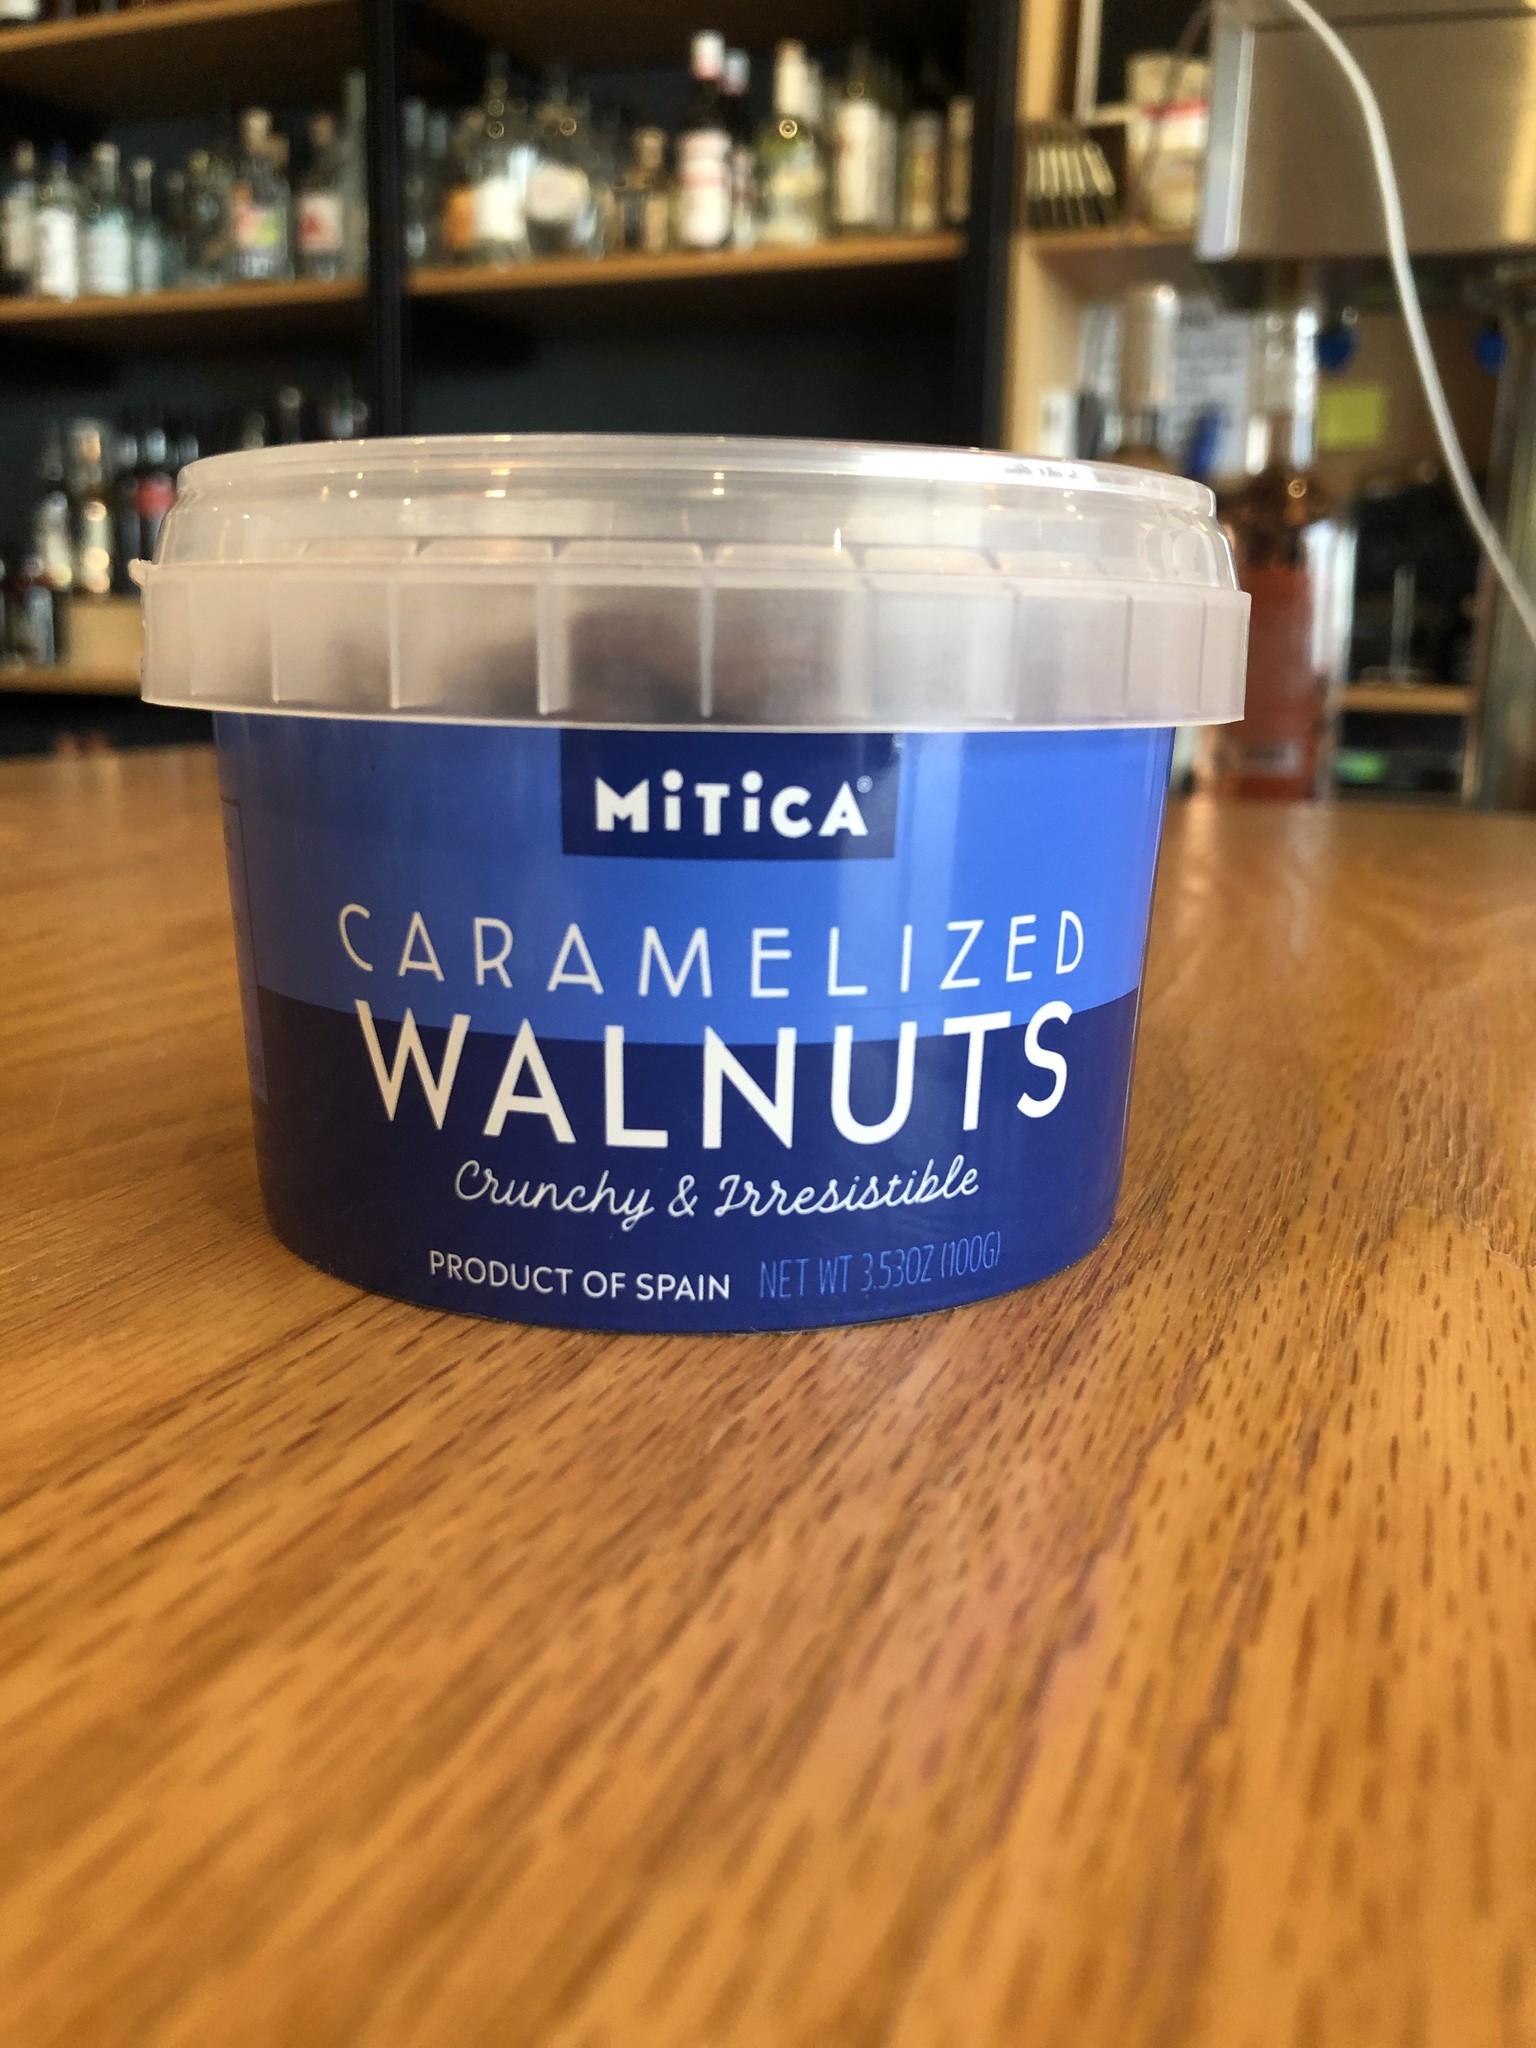 Mitica Mitica Carmelized Walnuts 3.53oz